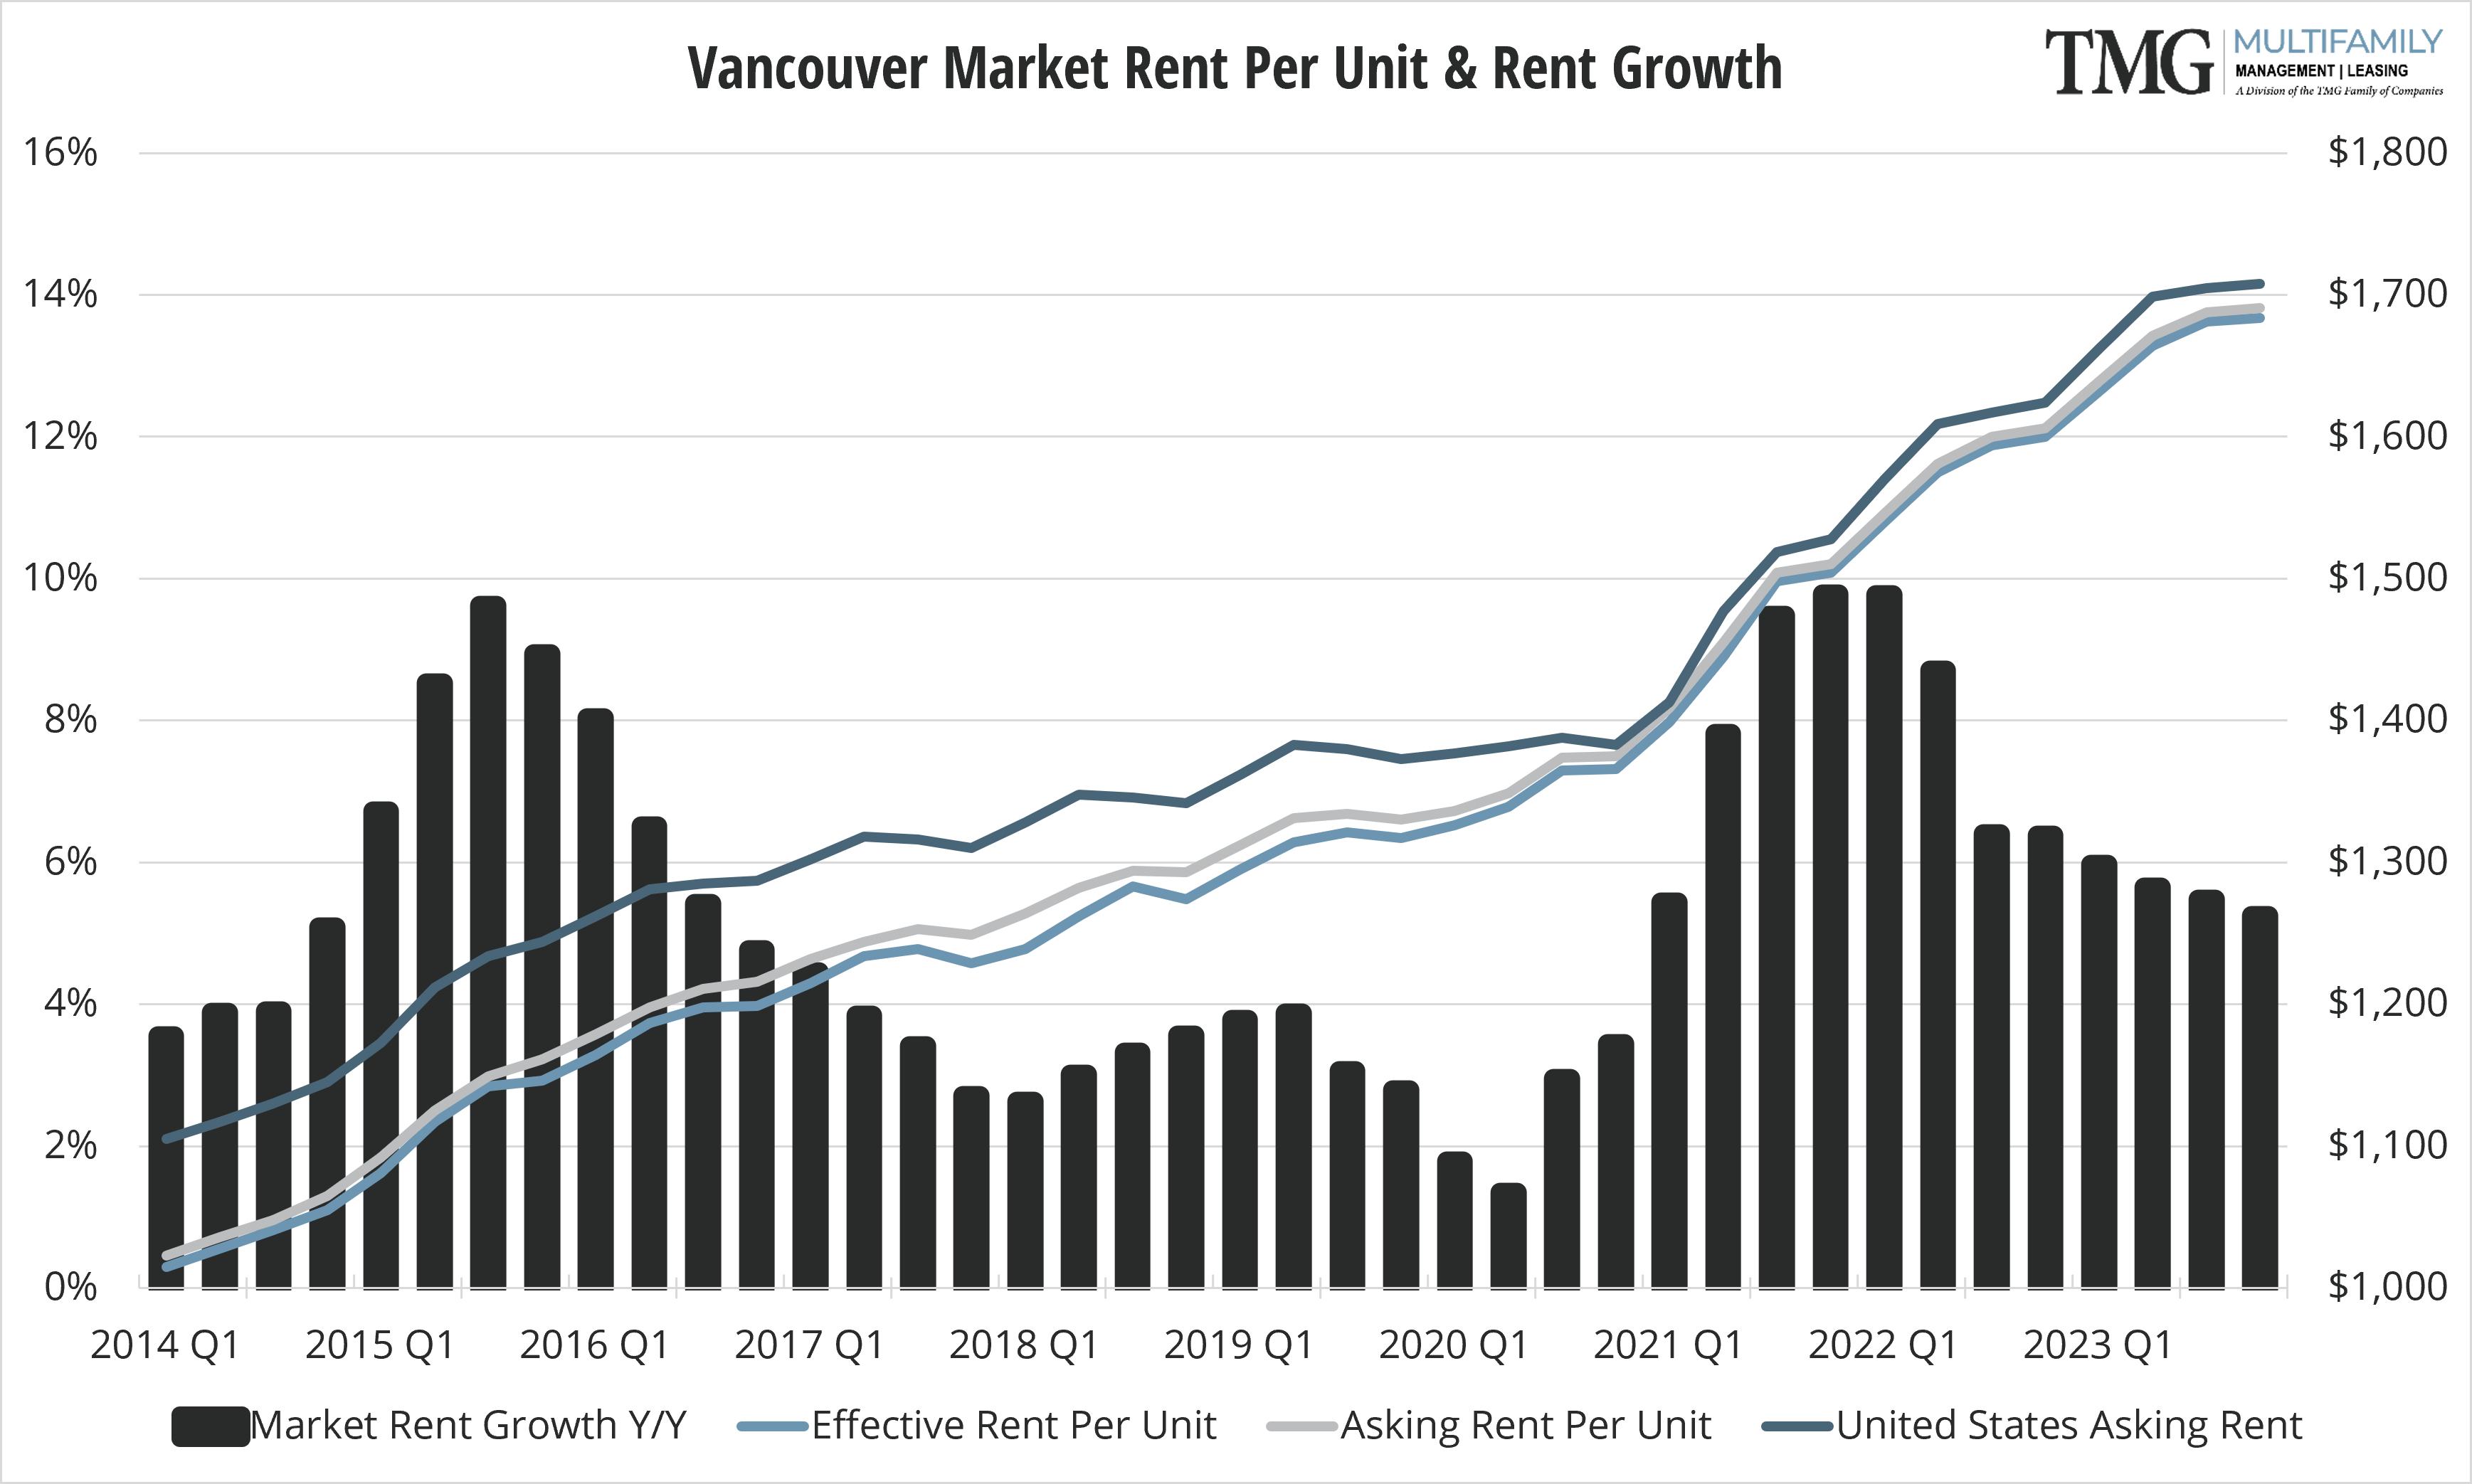 Vancouver Q4 Market Rent Per Unit and Rent Growth